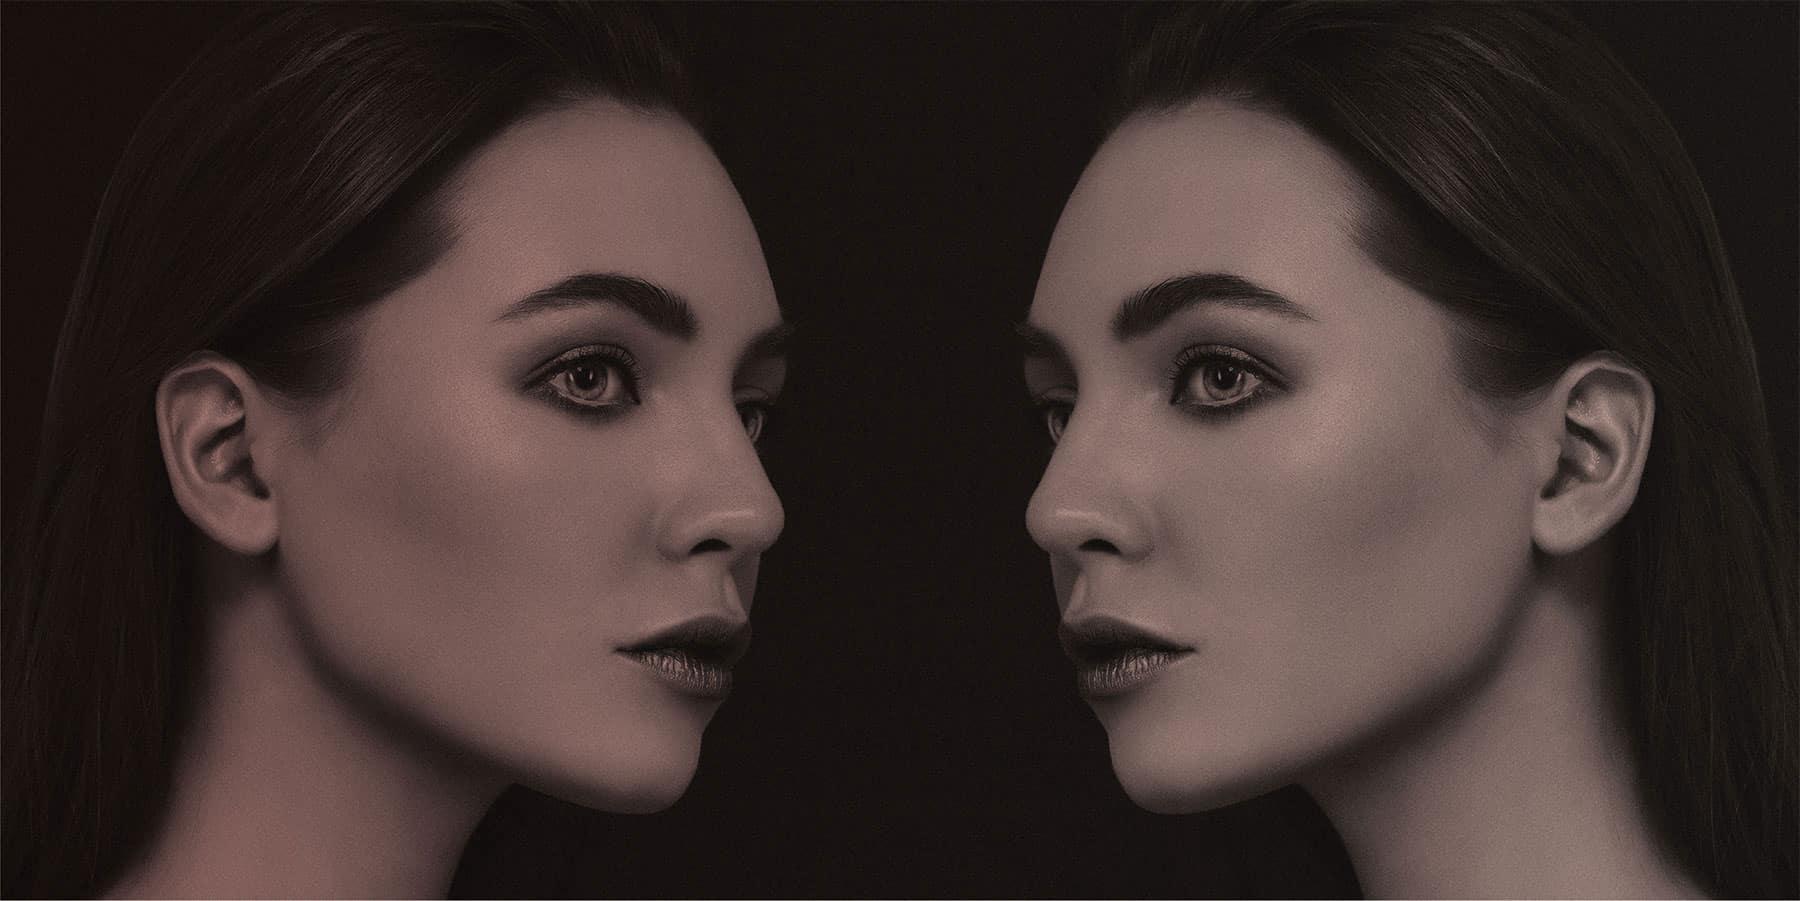 Sylfirm™ Face Lifting image